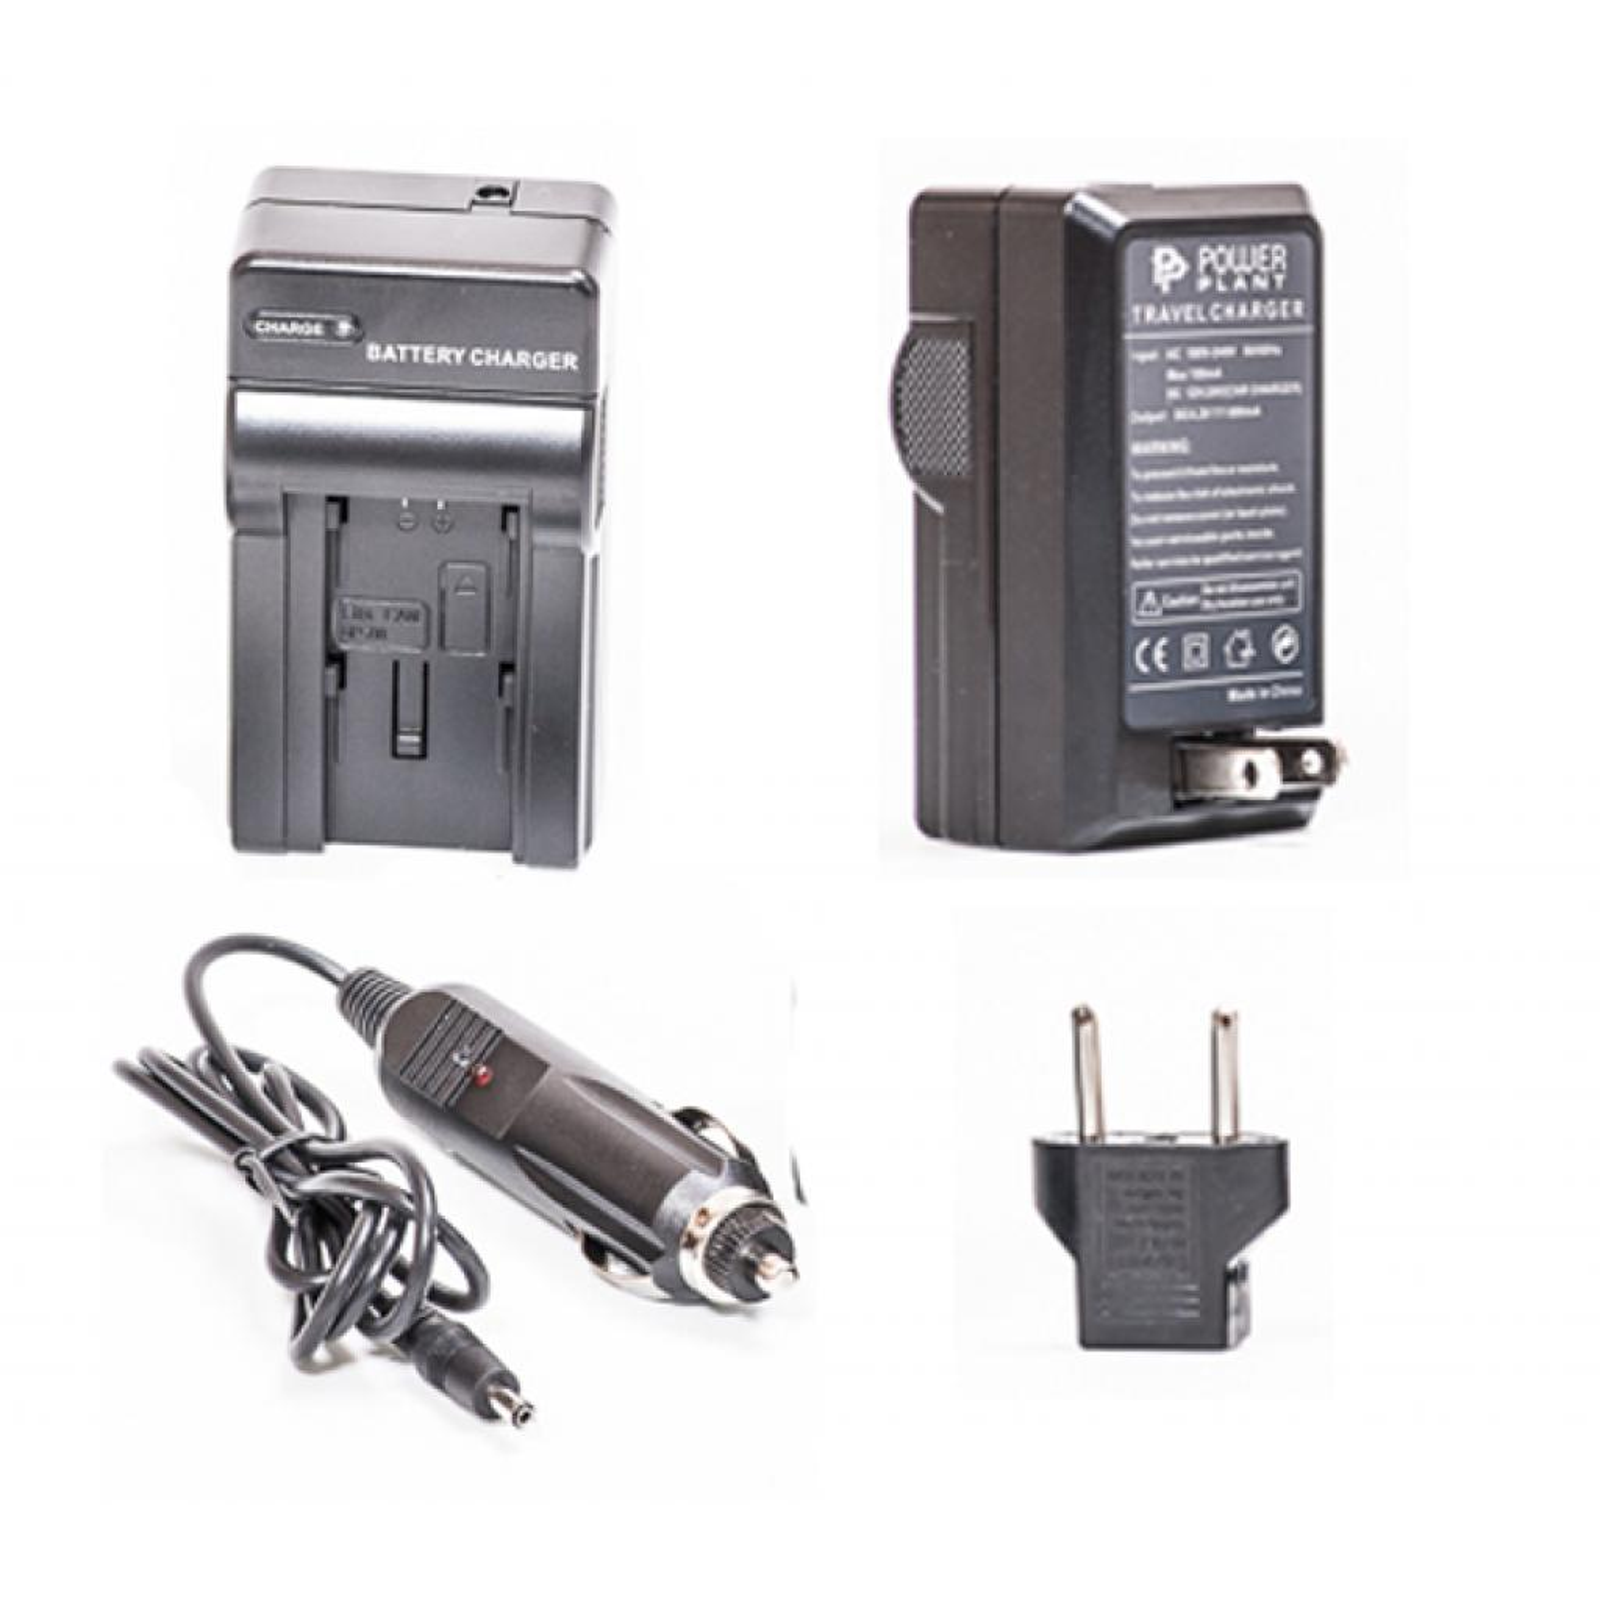 Аккумулятор к фото/видео PowerPlant Canon BP-718 (DV00DV1330) изображение 3